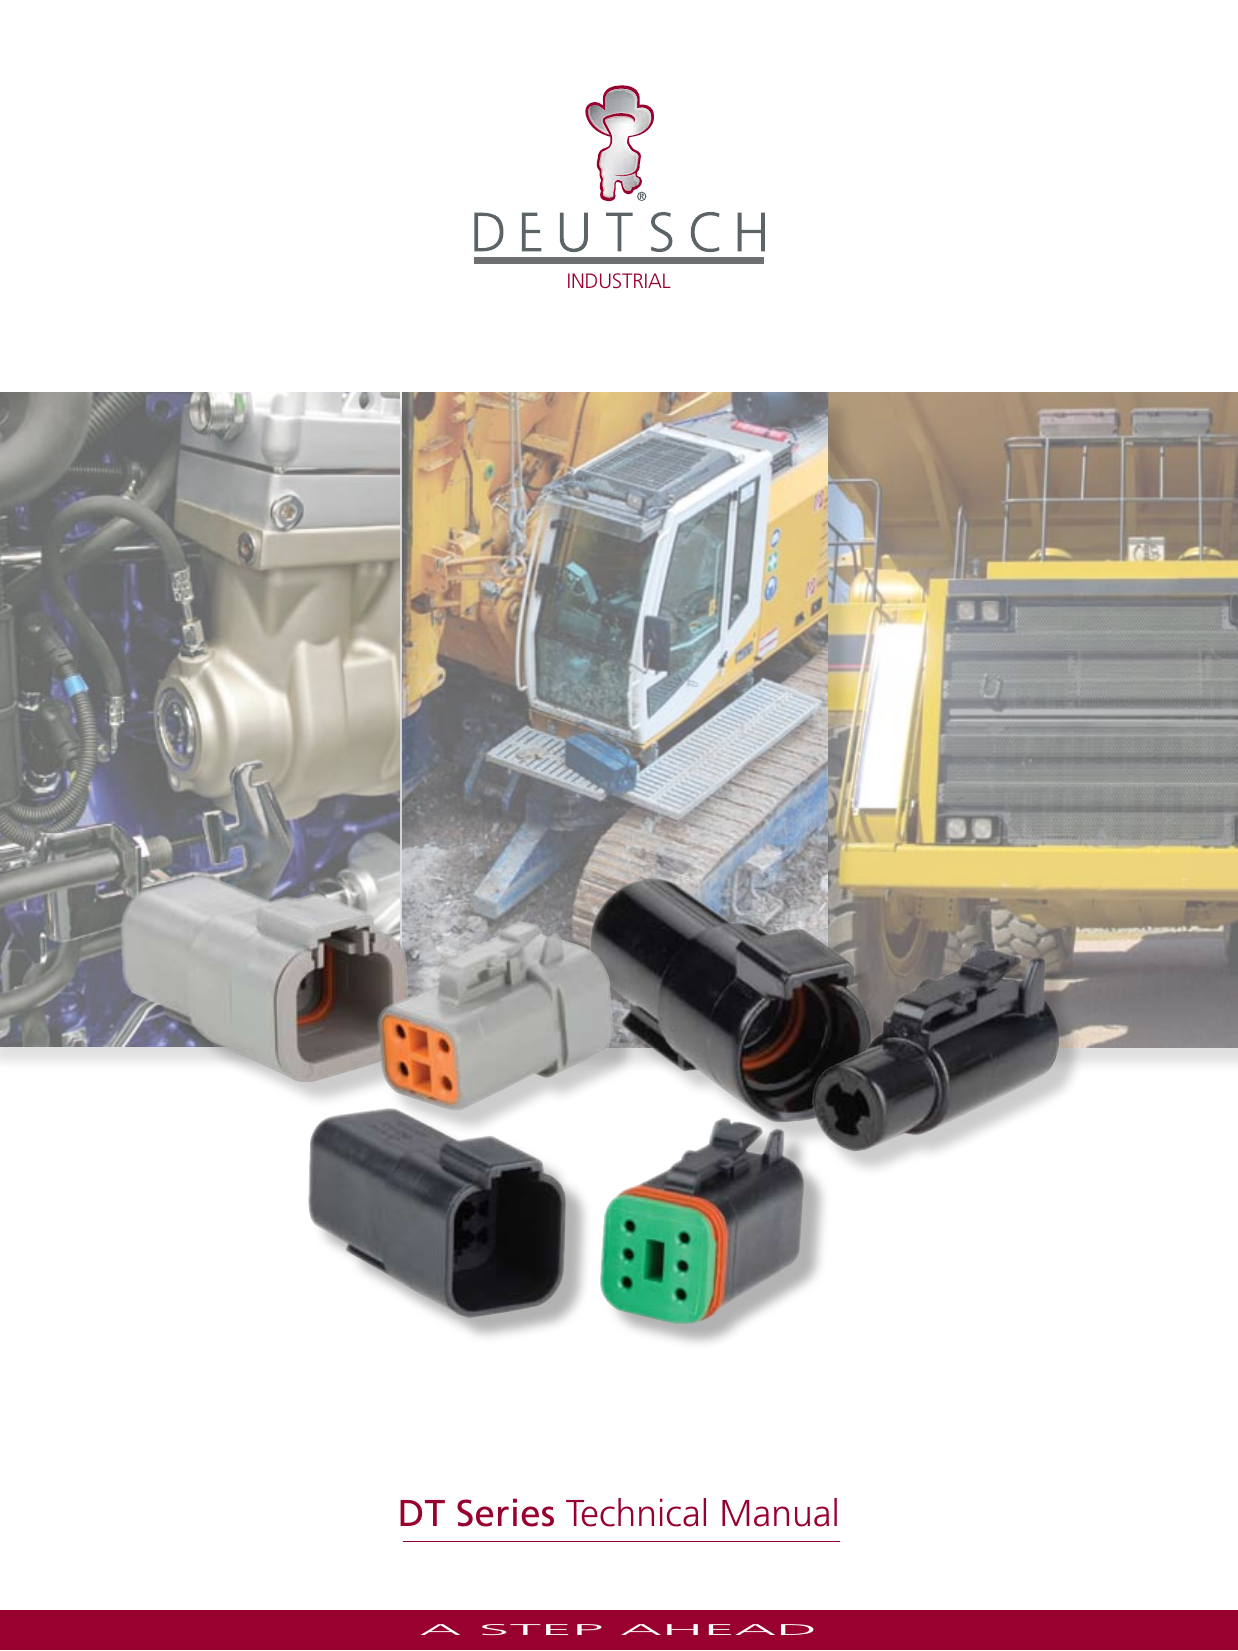 Dt Series Technical Manual 9 Pin Deutch Connector On Semi Trucks 018296686 1 1b7a12c1e4484d60c7bc4a366fcc4541